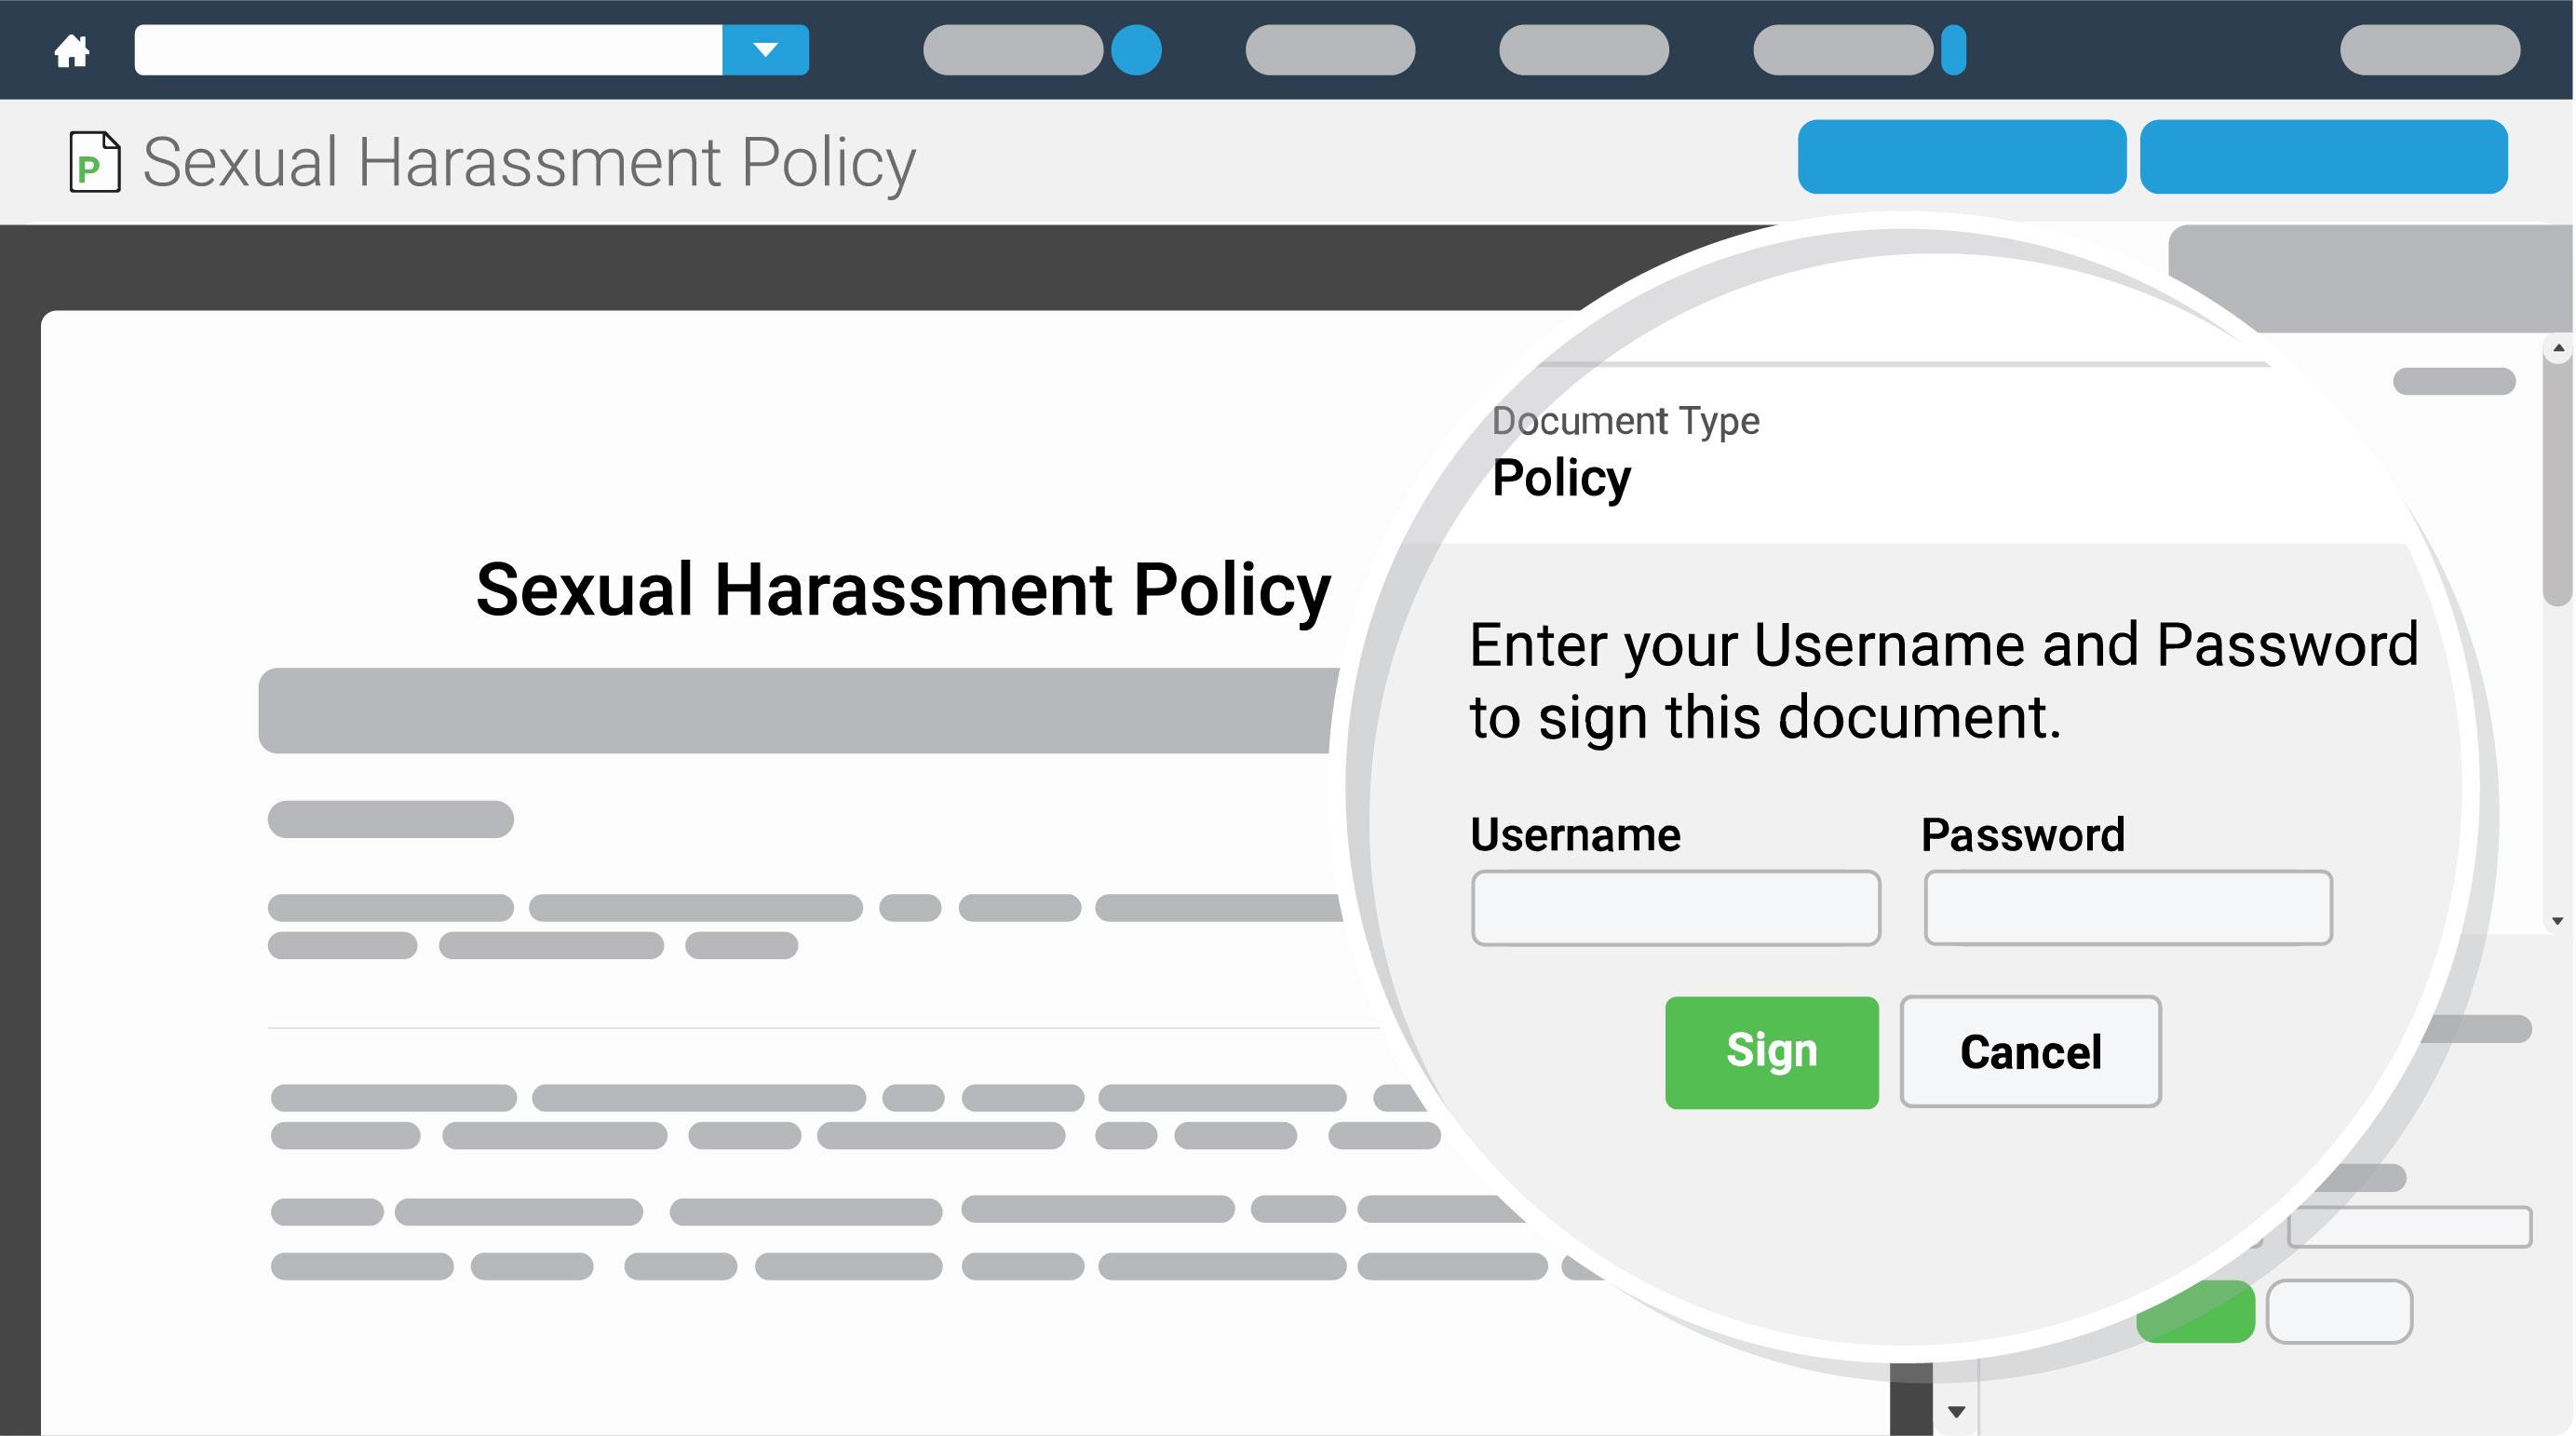 powerdms-application-screens-document-sign-sexual-harrasment-01-1